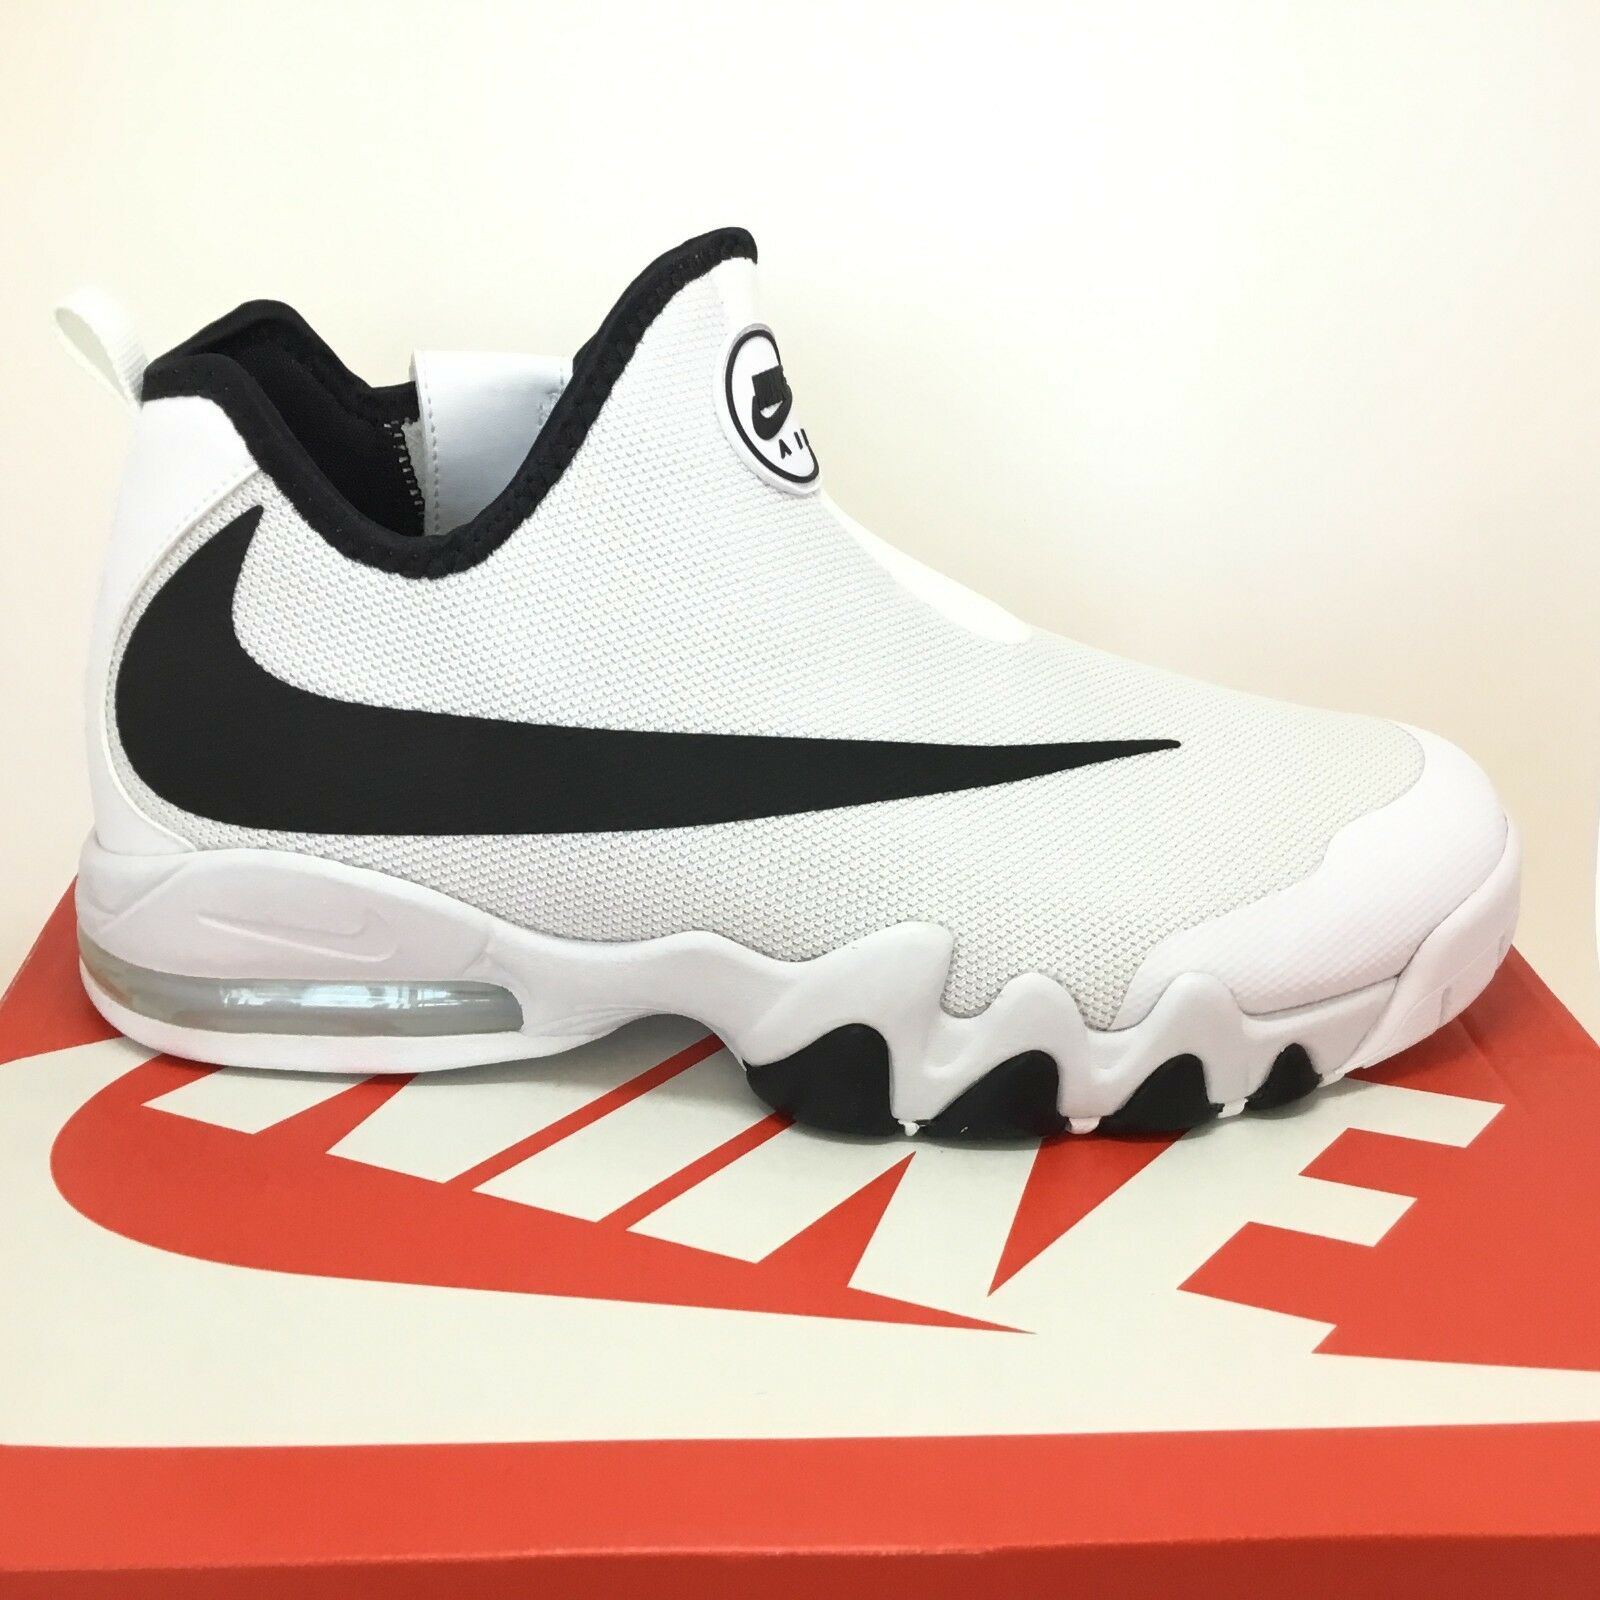 Nike air max grandi pennellate guanto 832759-100 basket Uomo bianco nero Uomo basket 46 5edce8